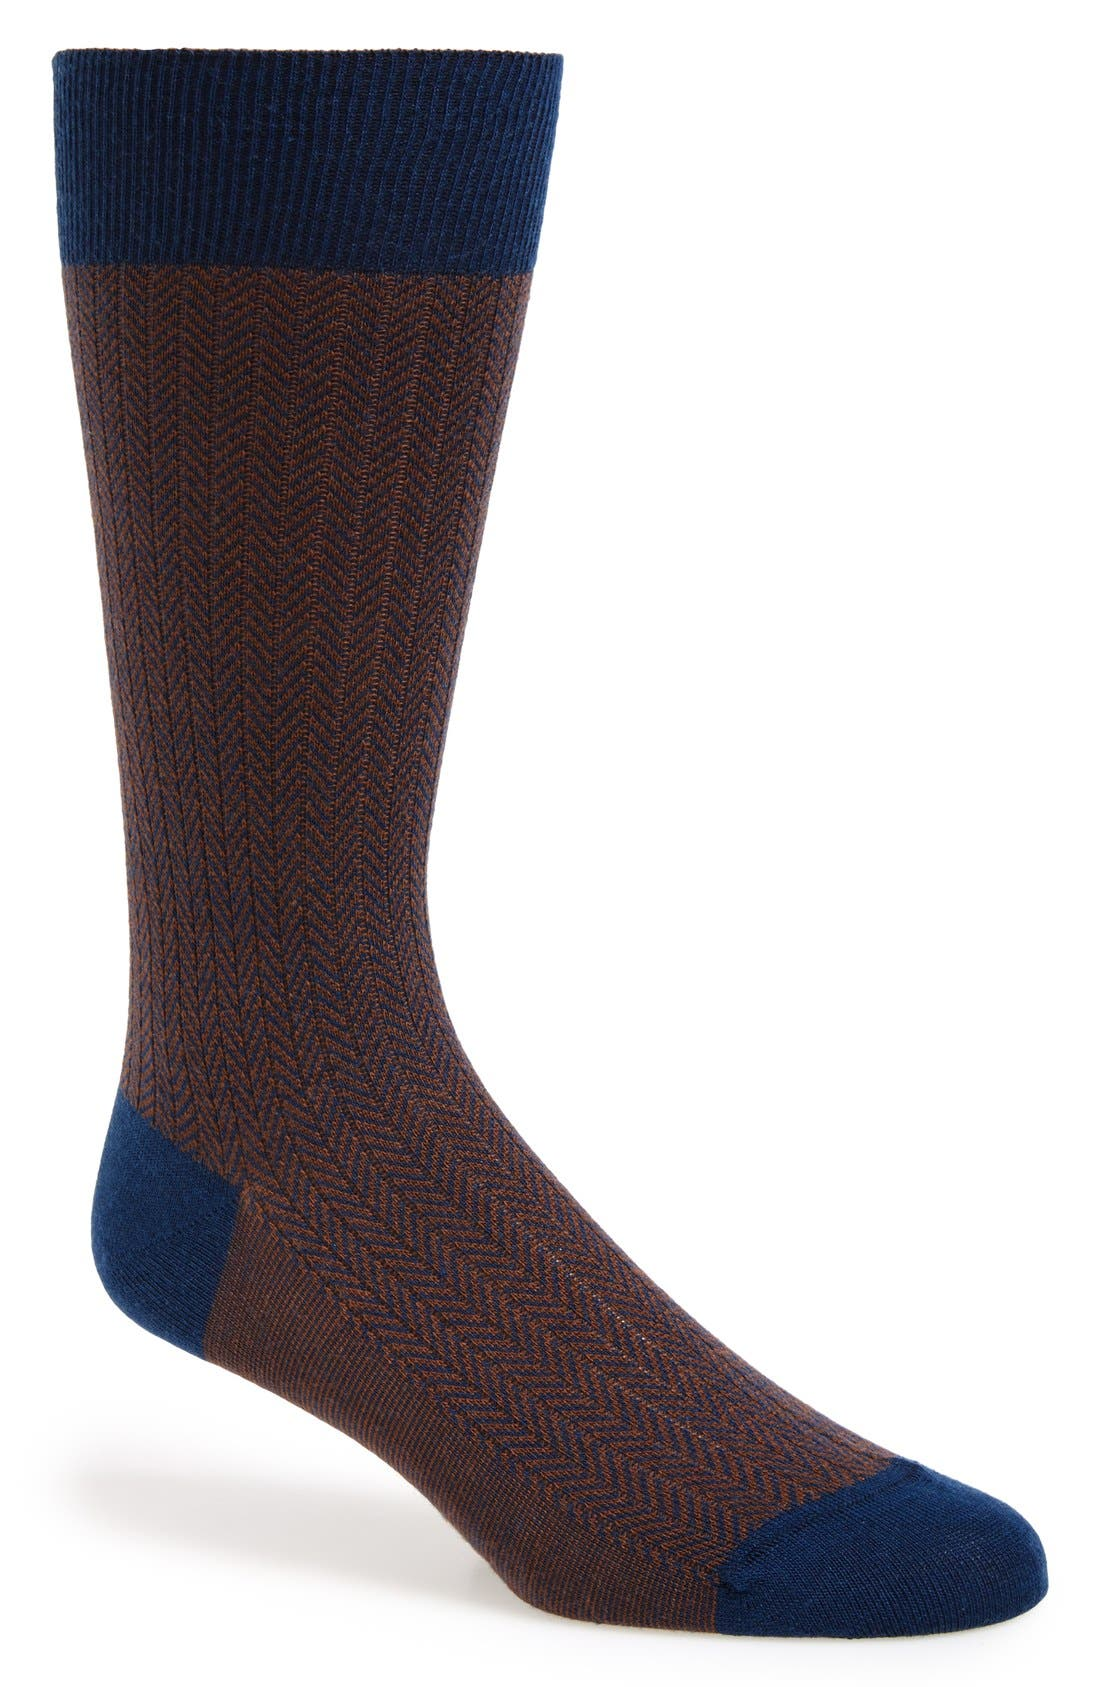 '5911' Mid-Calf Dress Socks,                         Main,                         color, Dark Blue